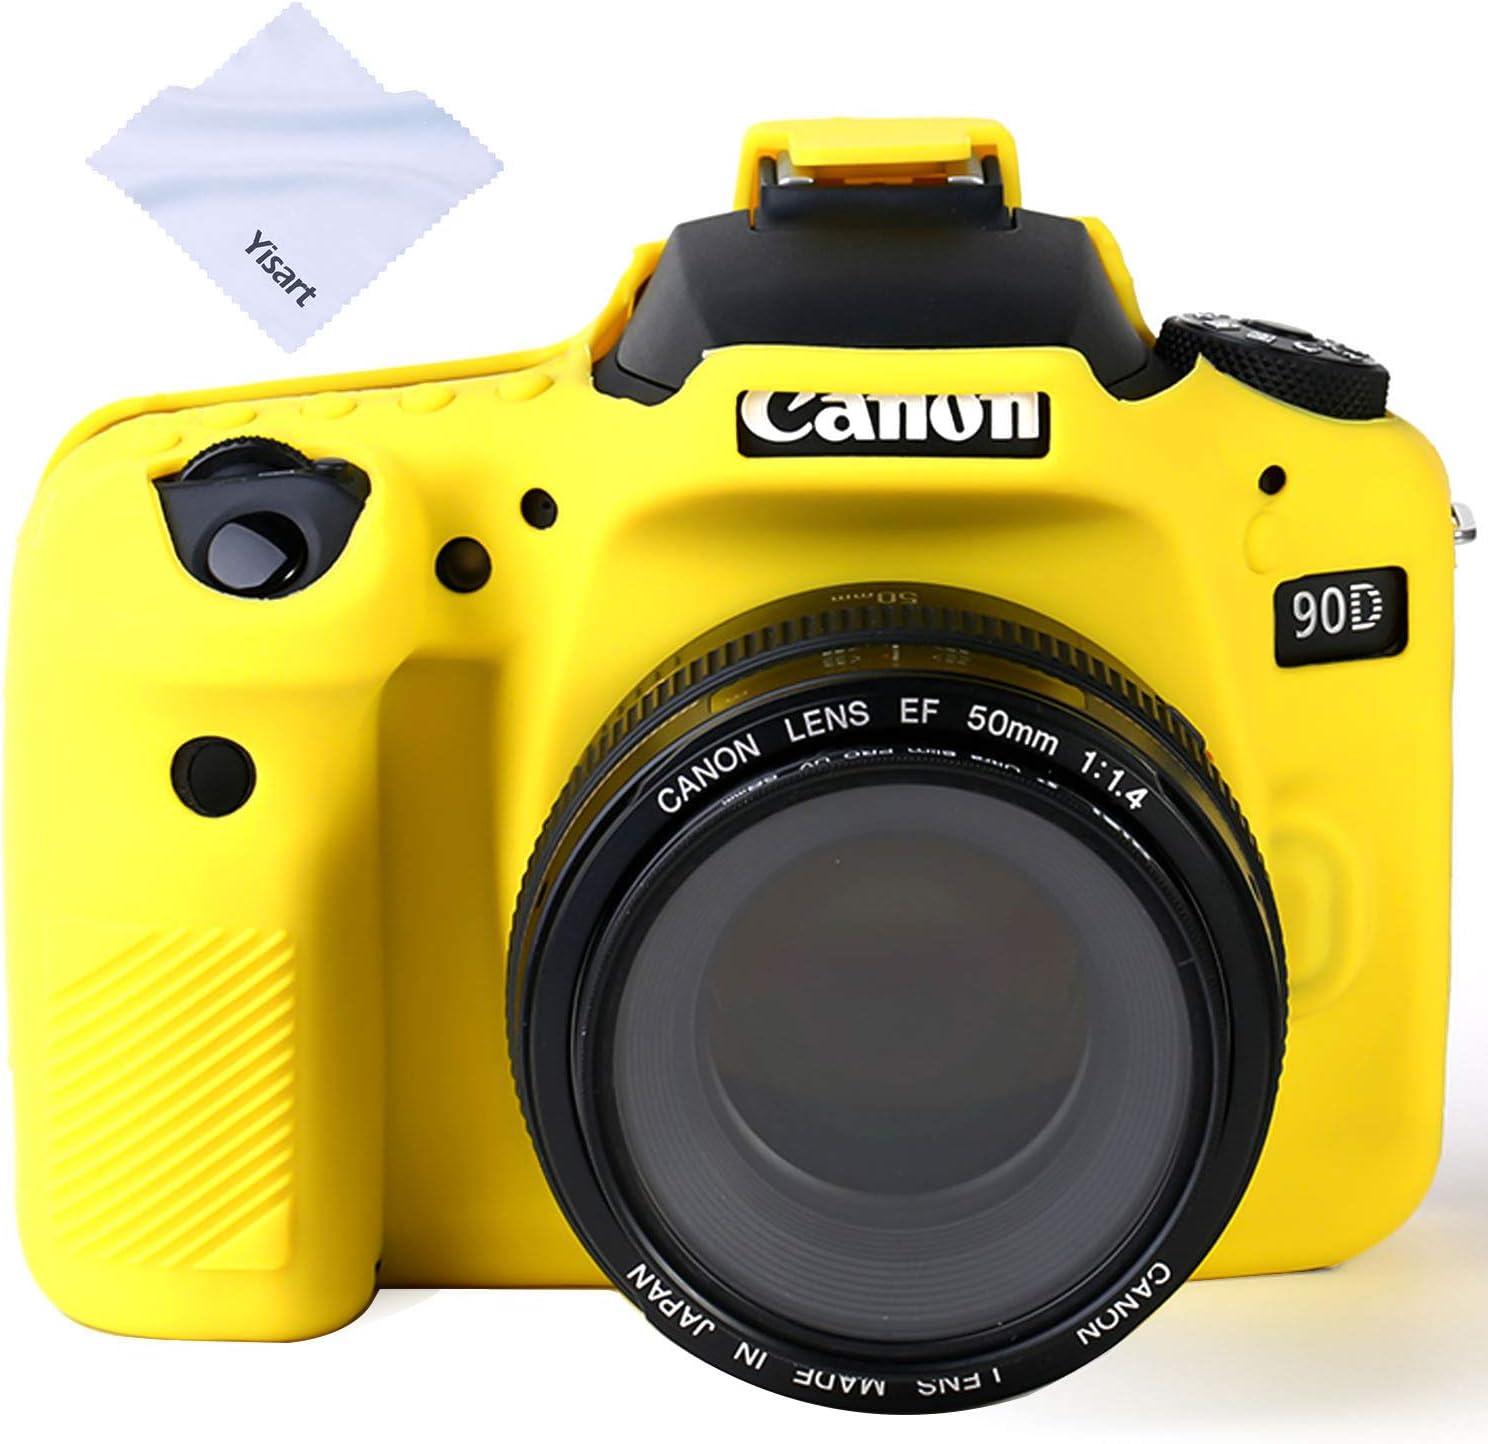 Yisau 90D Camera Case Professional Silicone Camera Case for Canon EOS 90D Camera Canon Rebel EOS 90D Camera Beautiful Companion (Yellow)